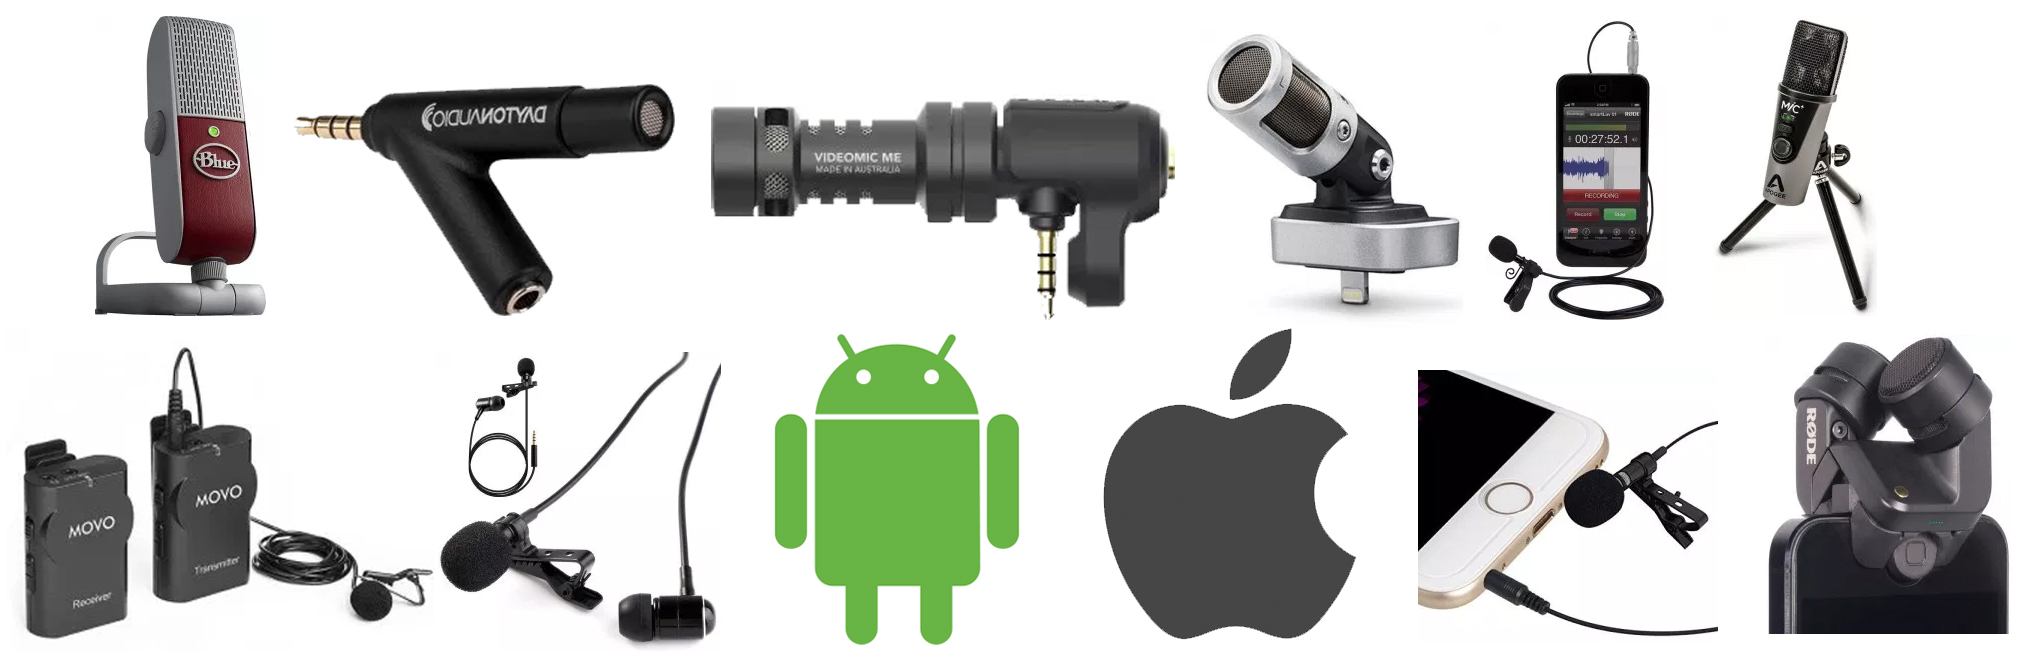 The Top 10 Best Microphones For Smartphones Mic Reviews